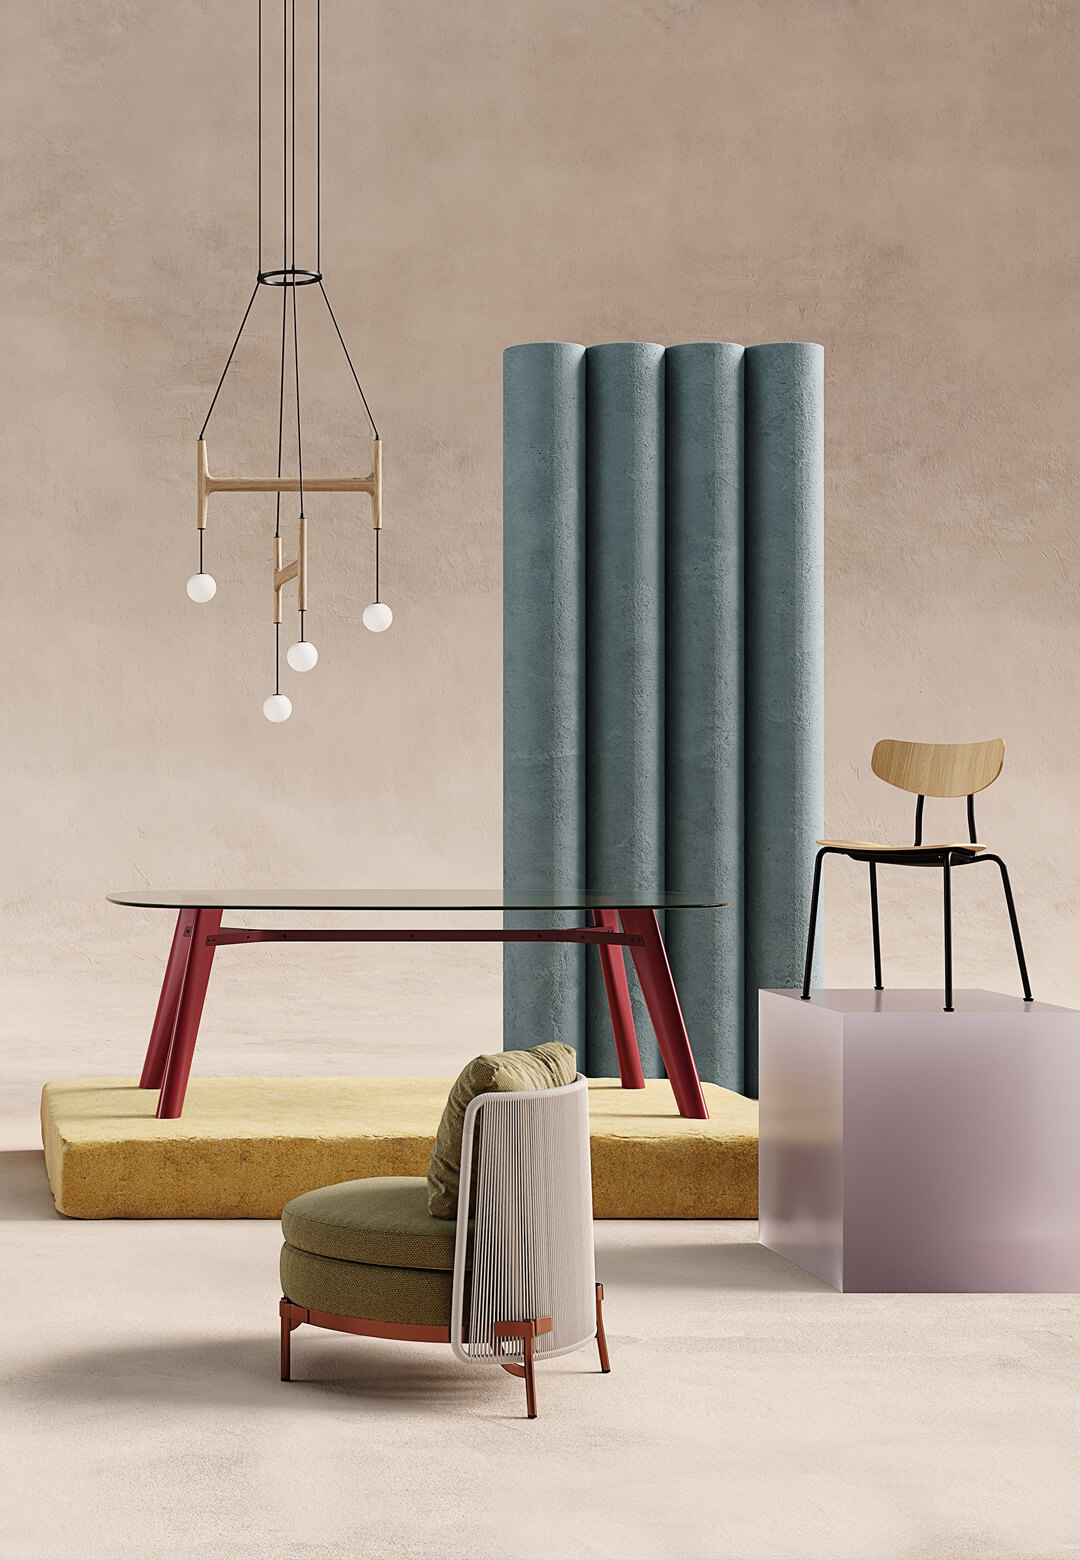 Studio Salaris for Design News 2020 - Living Corriere  Alessandra Salaris   STIRworld